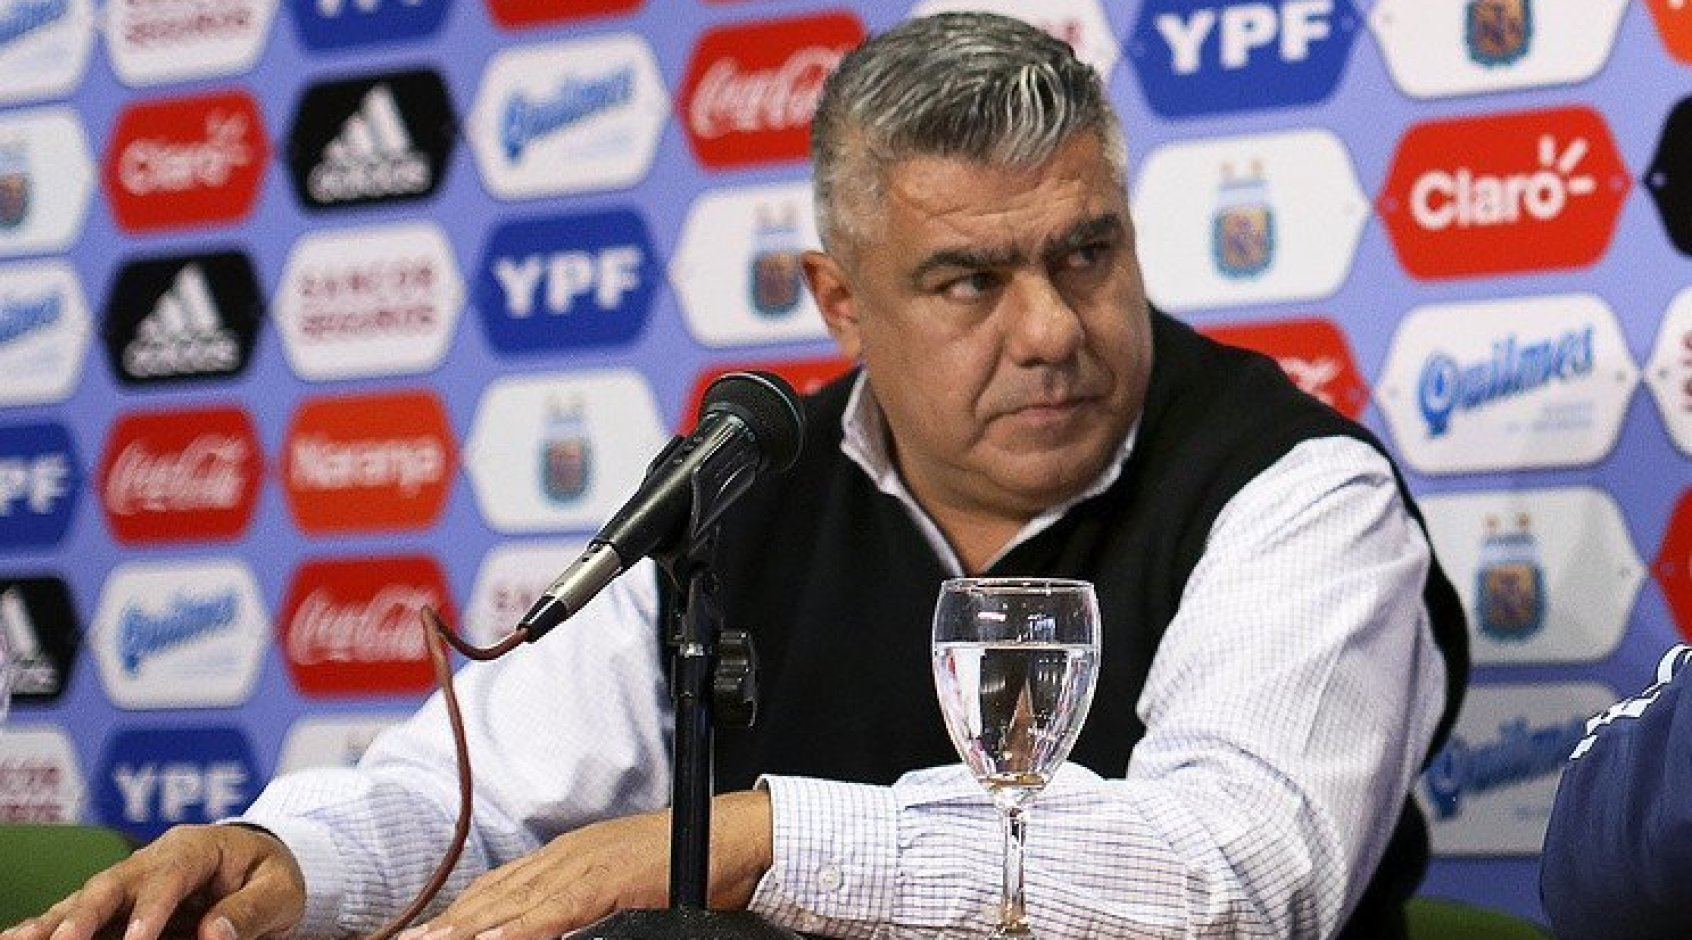 Президент Федерации футбола Аргентины Клаудио Тапиа исключен из совета ФИФА